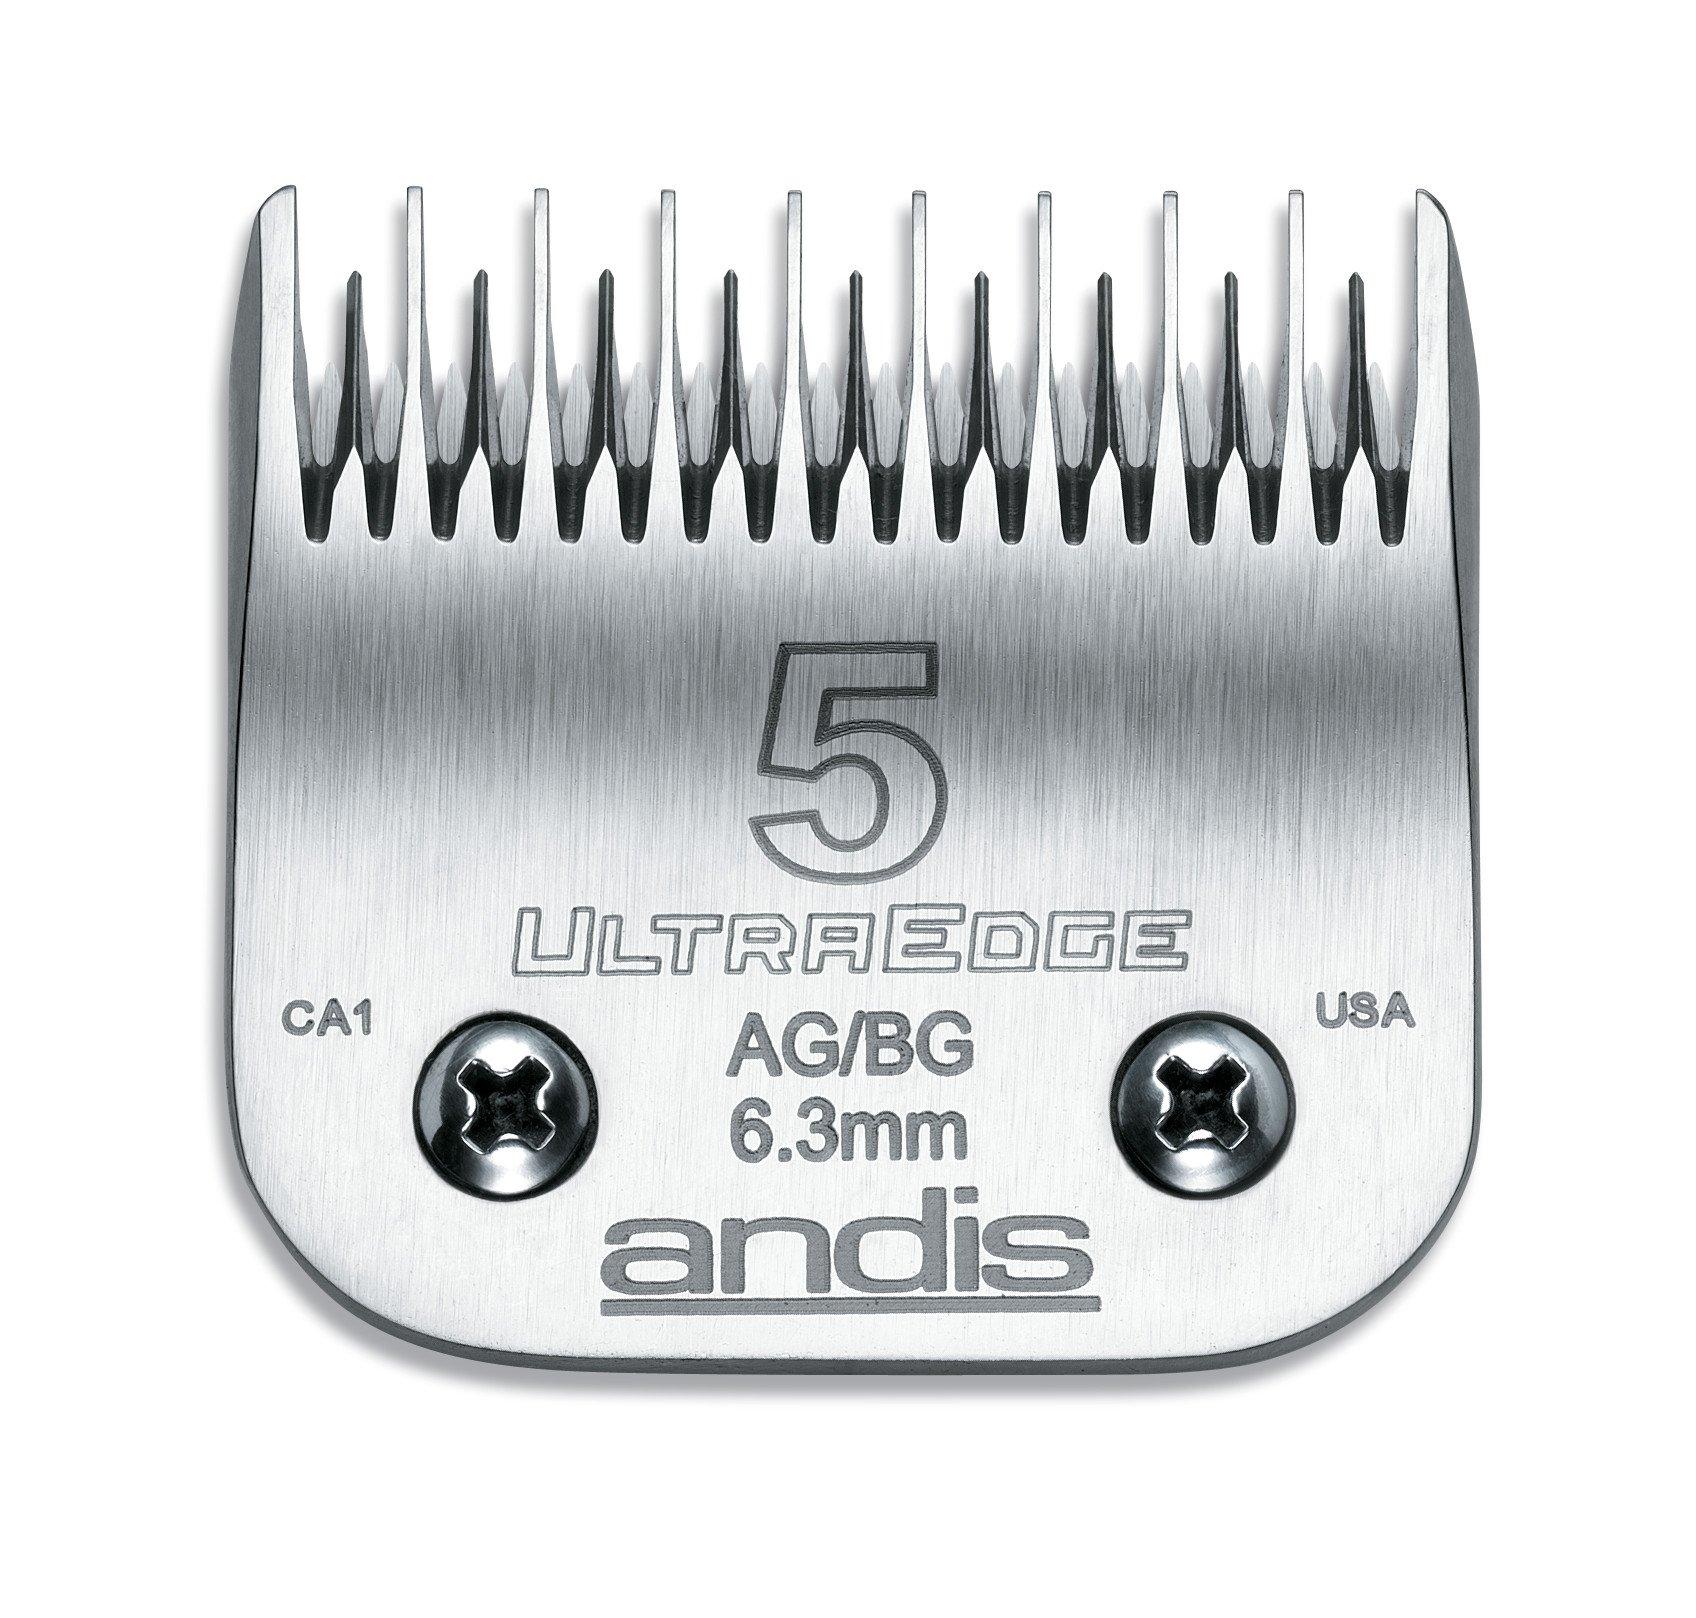 Cuchillas : Andis 5 Ultra Edge 64079 Reemplazo